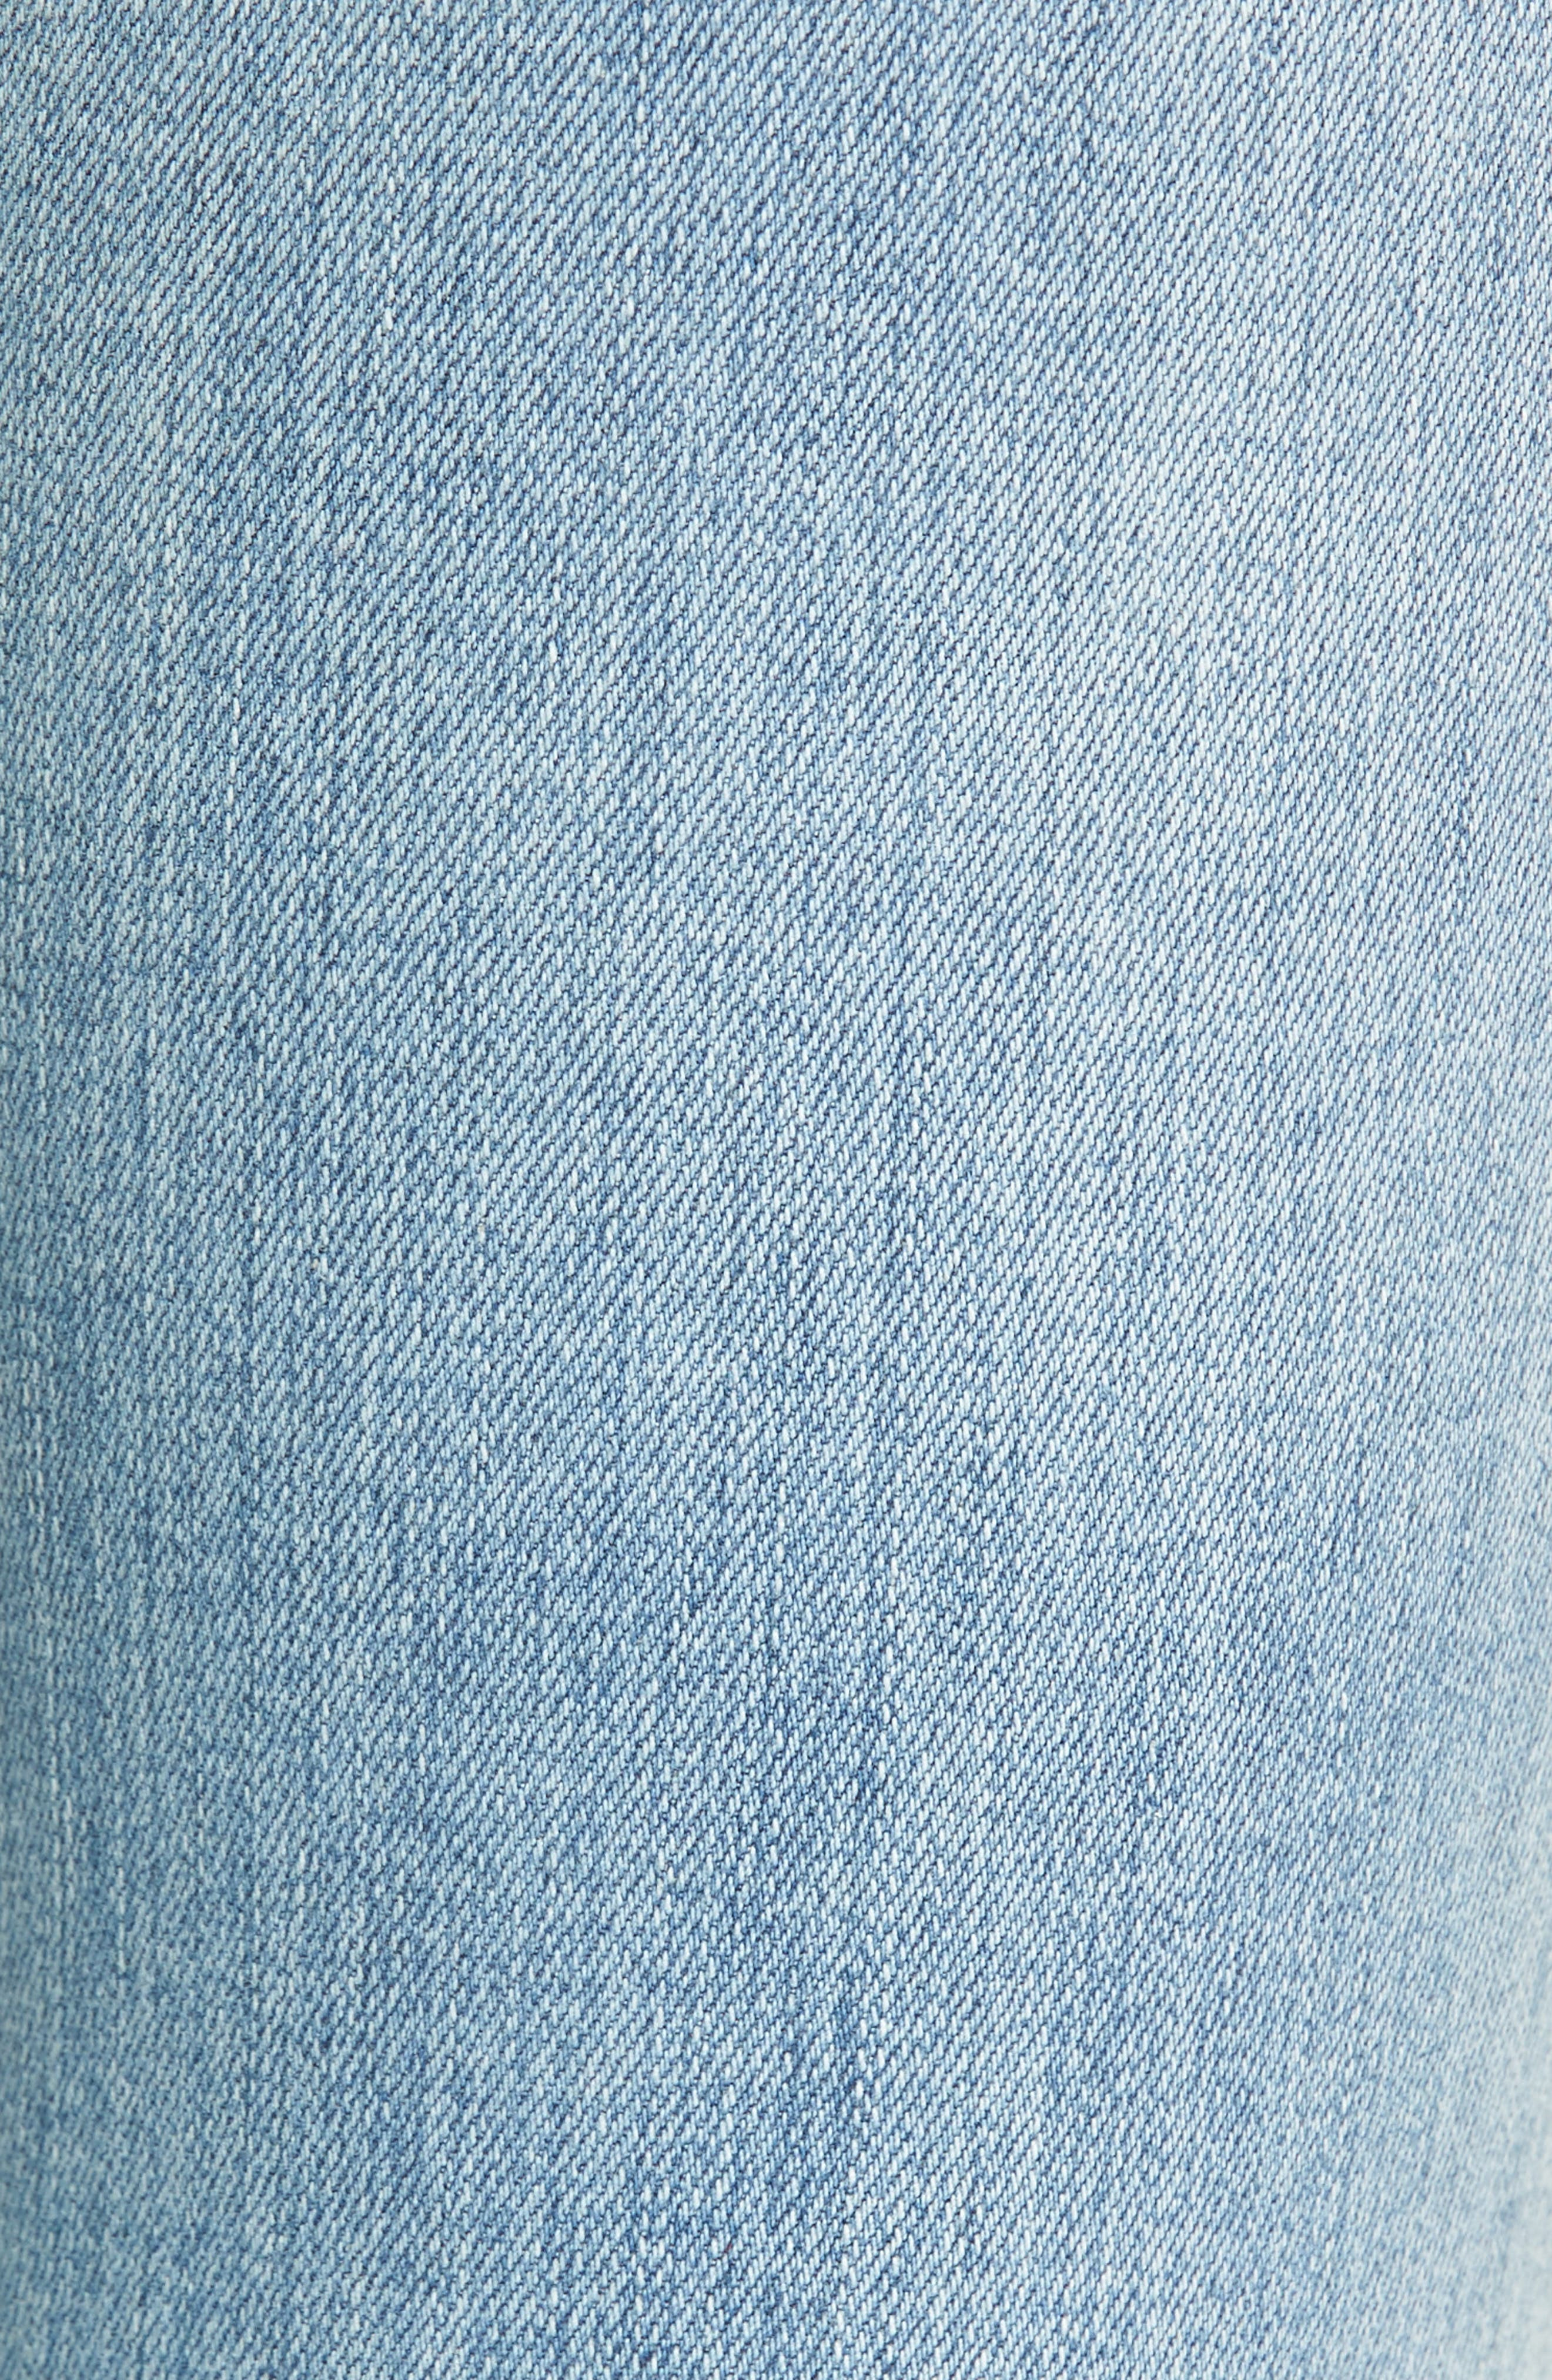 Mile High Super Skinny Jeans,                             Alternate thumbnail 6, color,                             Prime Time